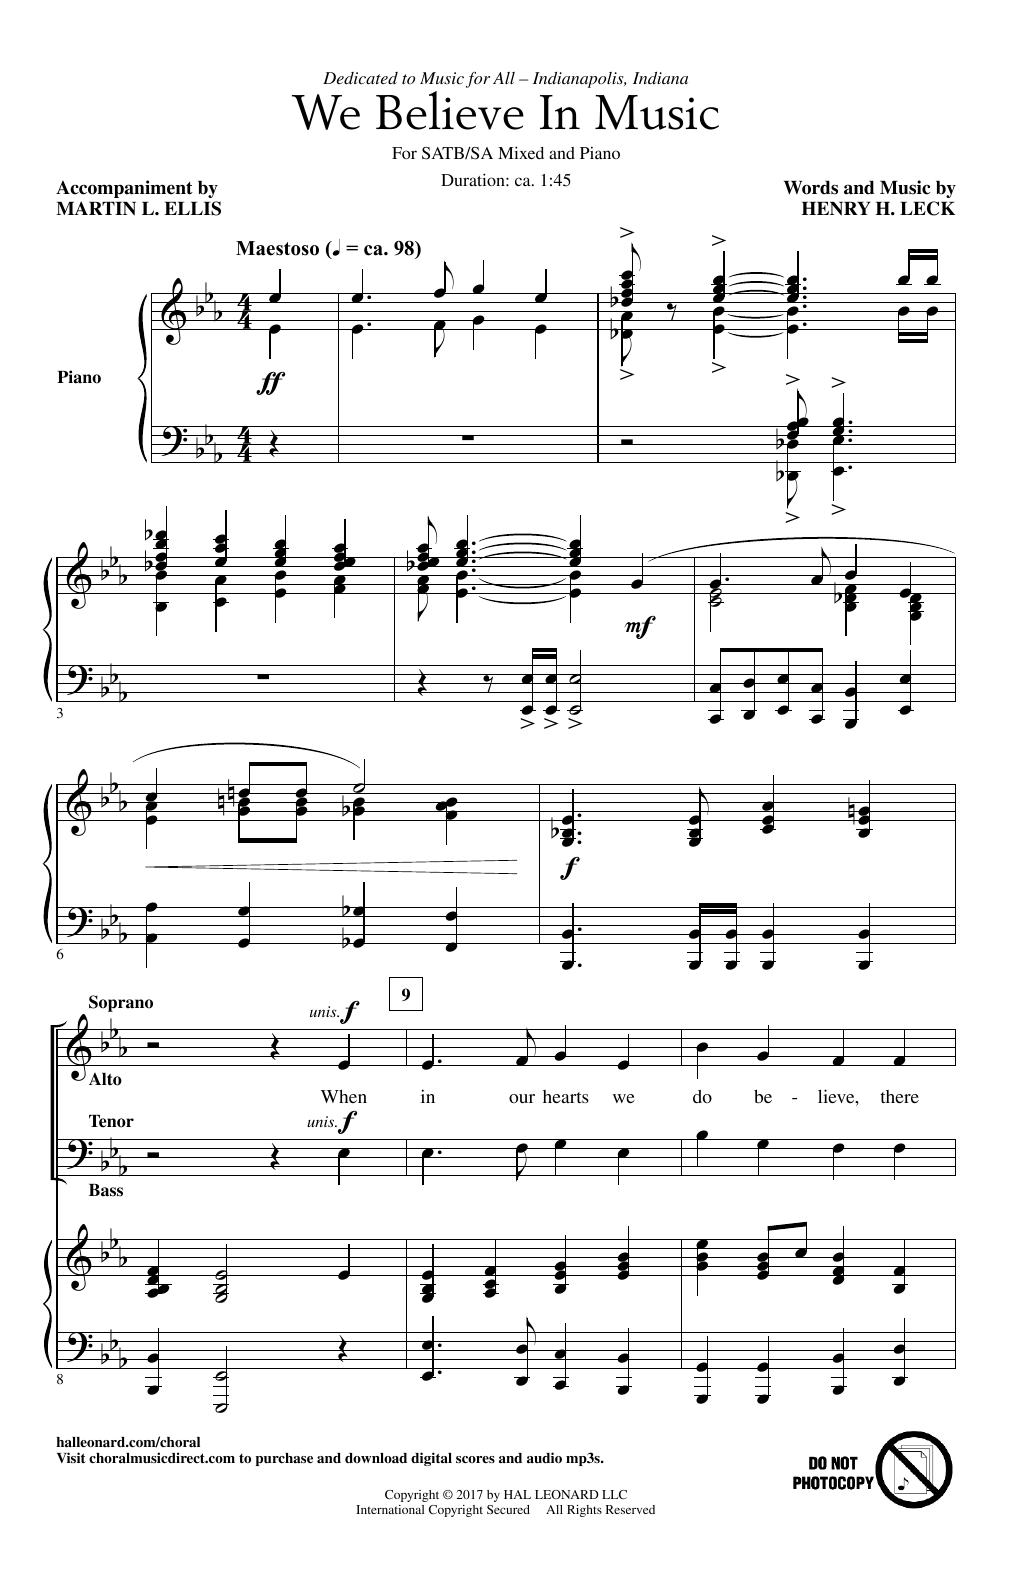 We Believe In Music Sheet Music